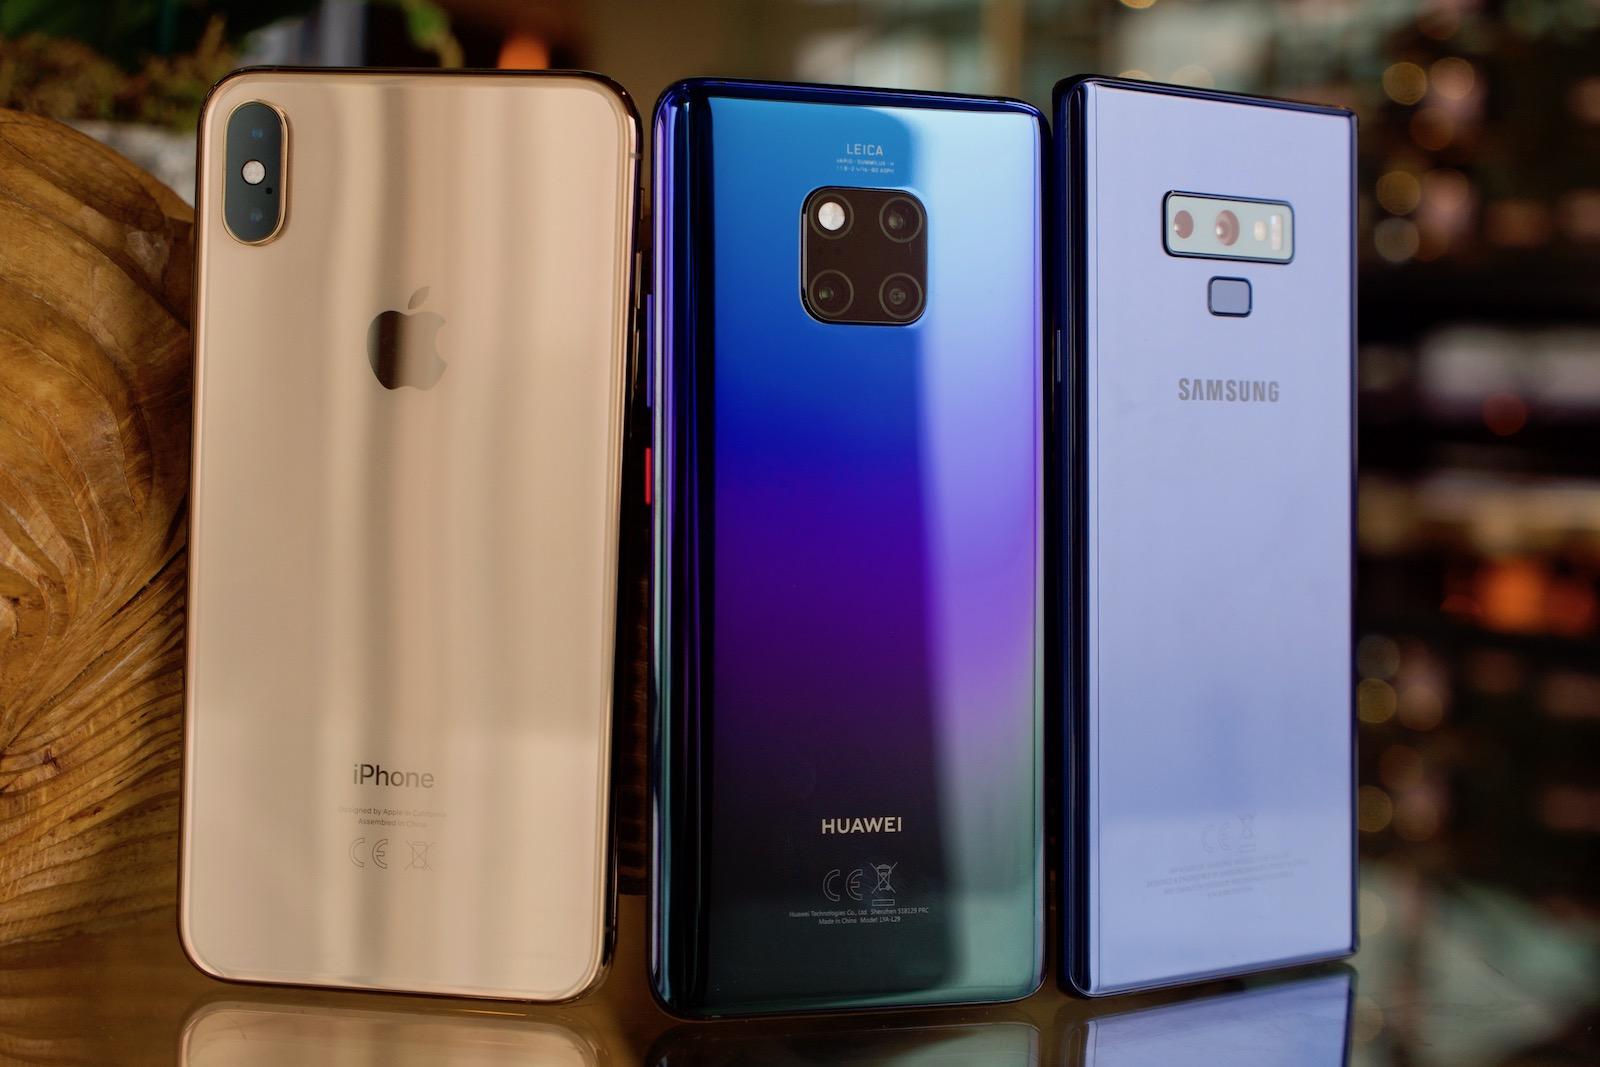 Huawei Mate 20 Pro vs iPhone XS Max vs Galaxy Note 9 Camera Comparison